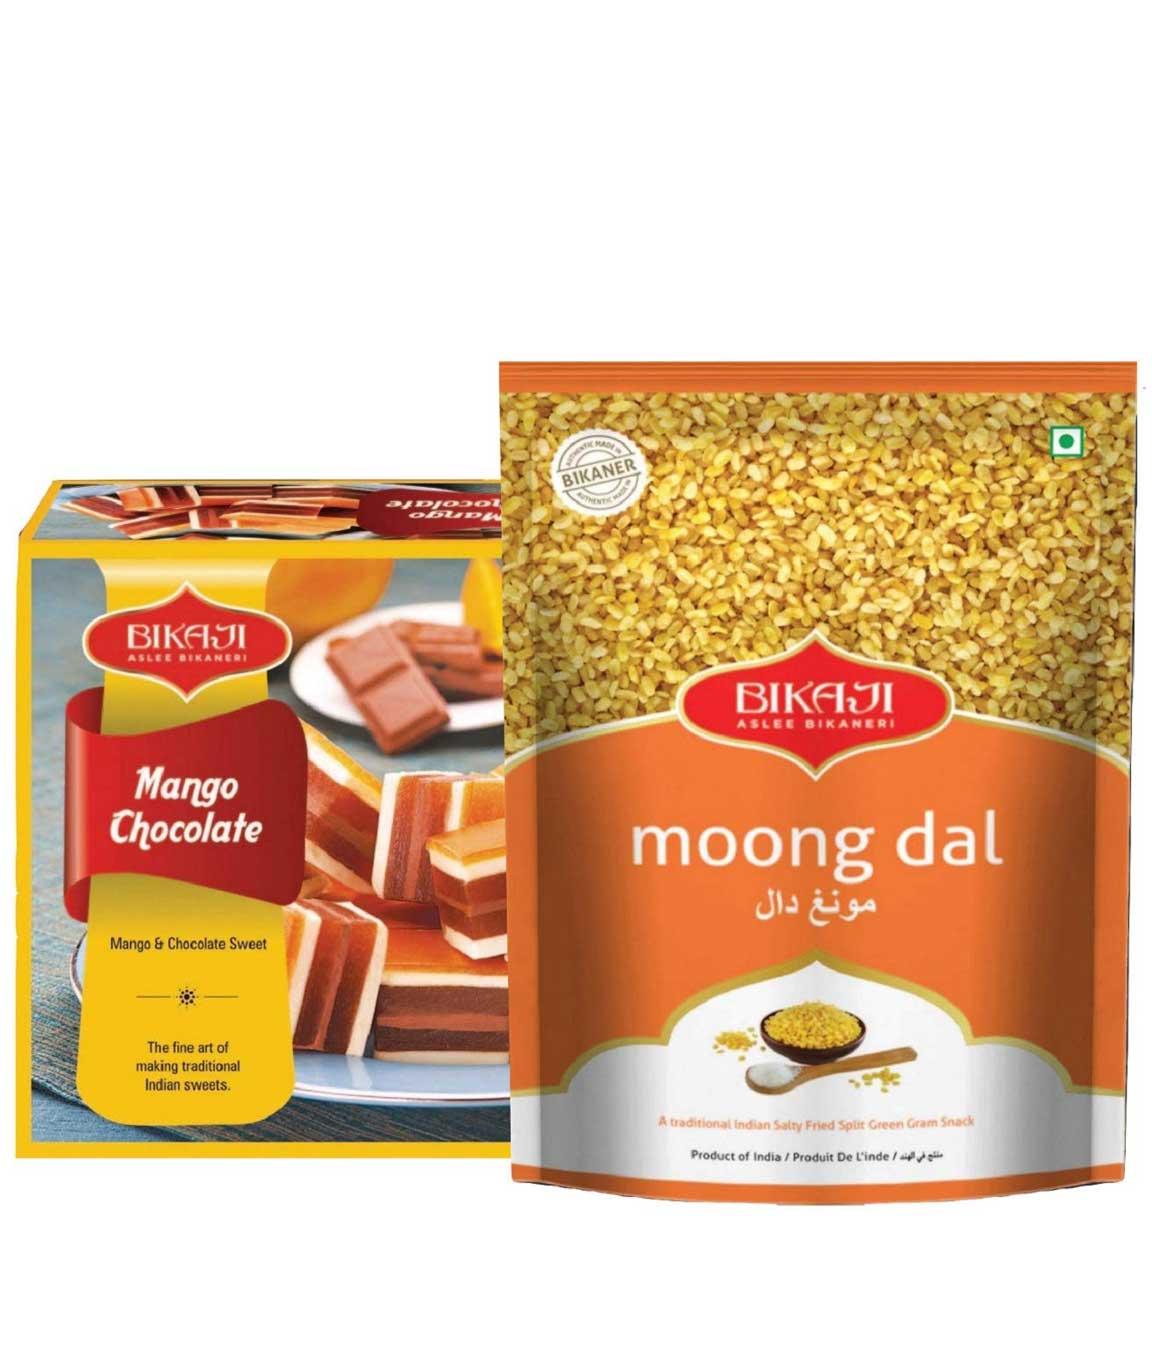 Bikaji Combo Pack - Mango Chocolate 500g - Moong Daal 400g - Pack of 2